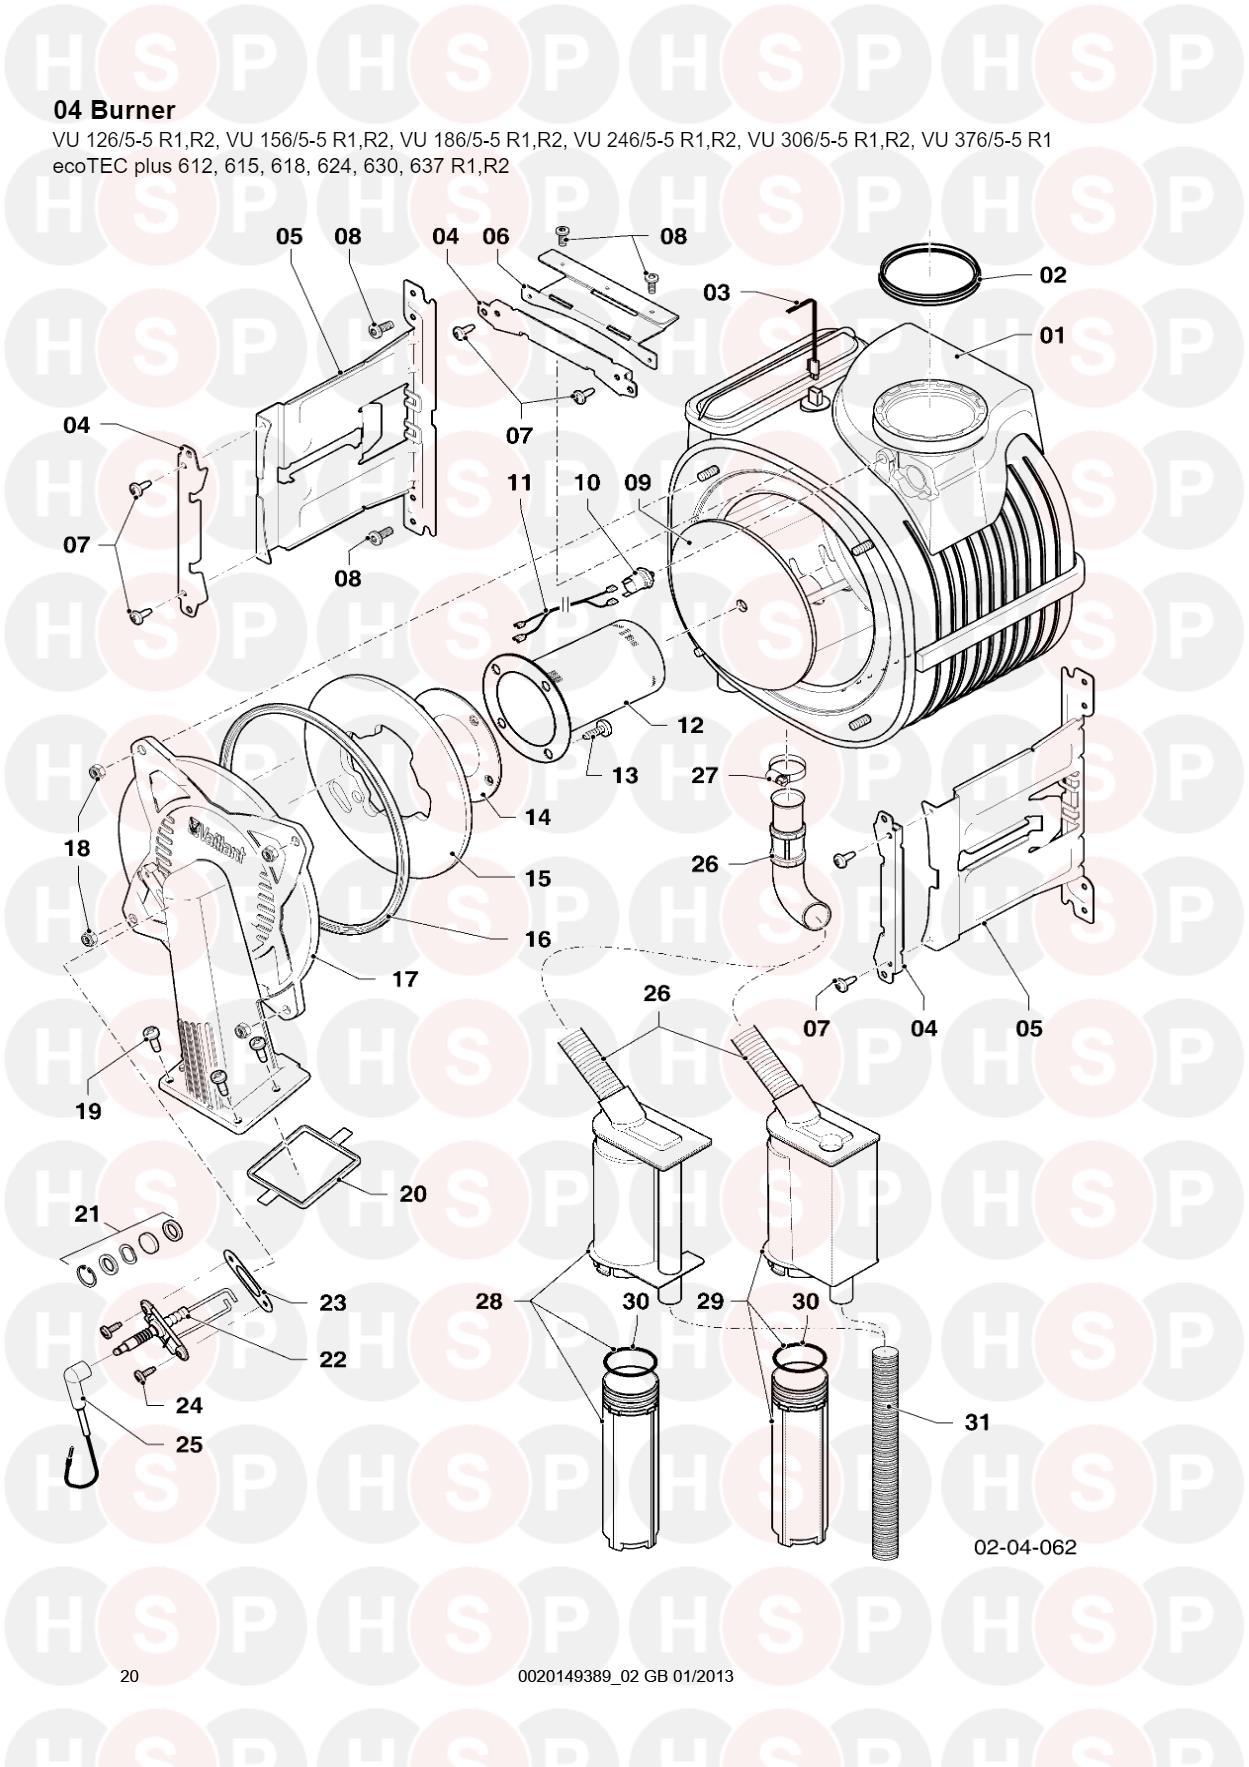 Vaillant Ecotec Plus 612 615 618 624 630 637 04 Burner Sheet 2 R2 Engine Diagram For